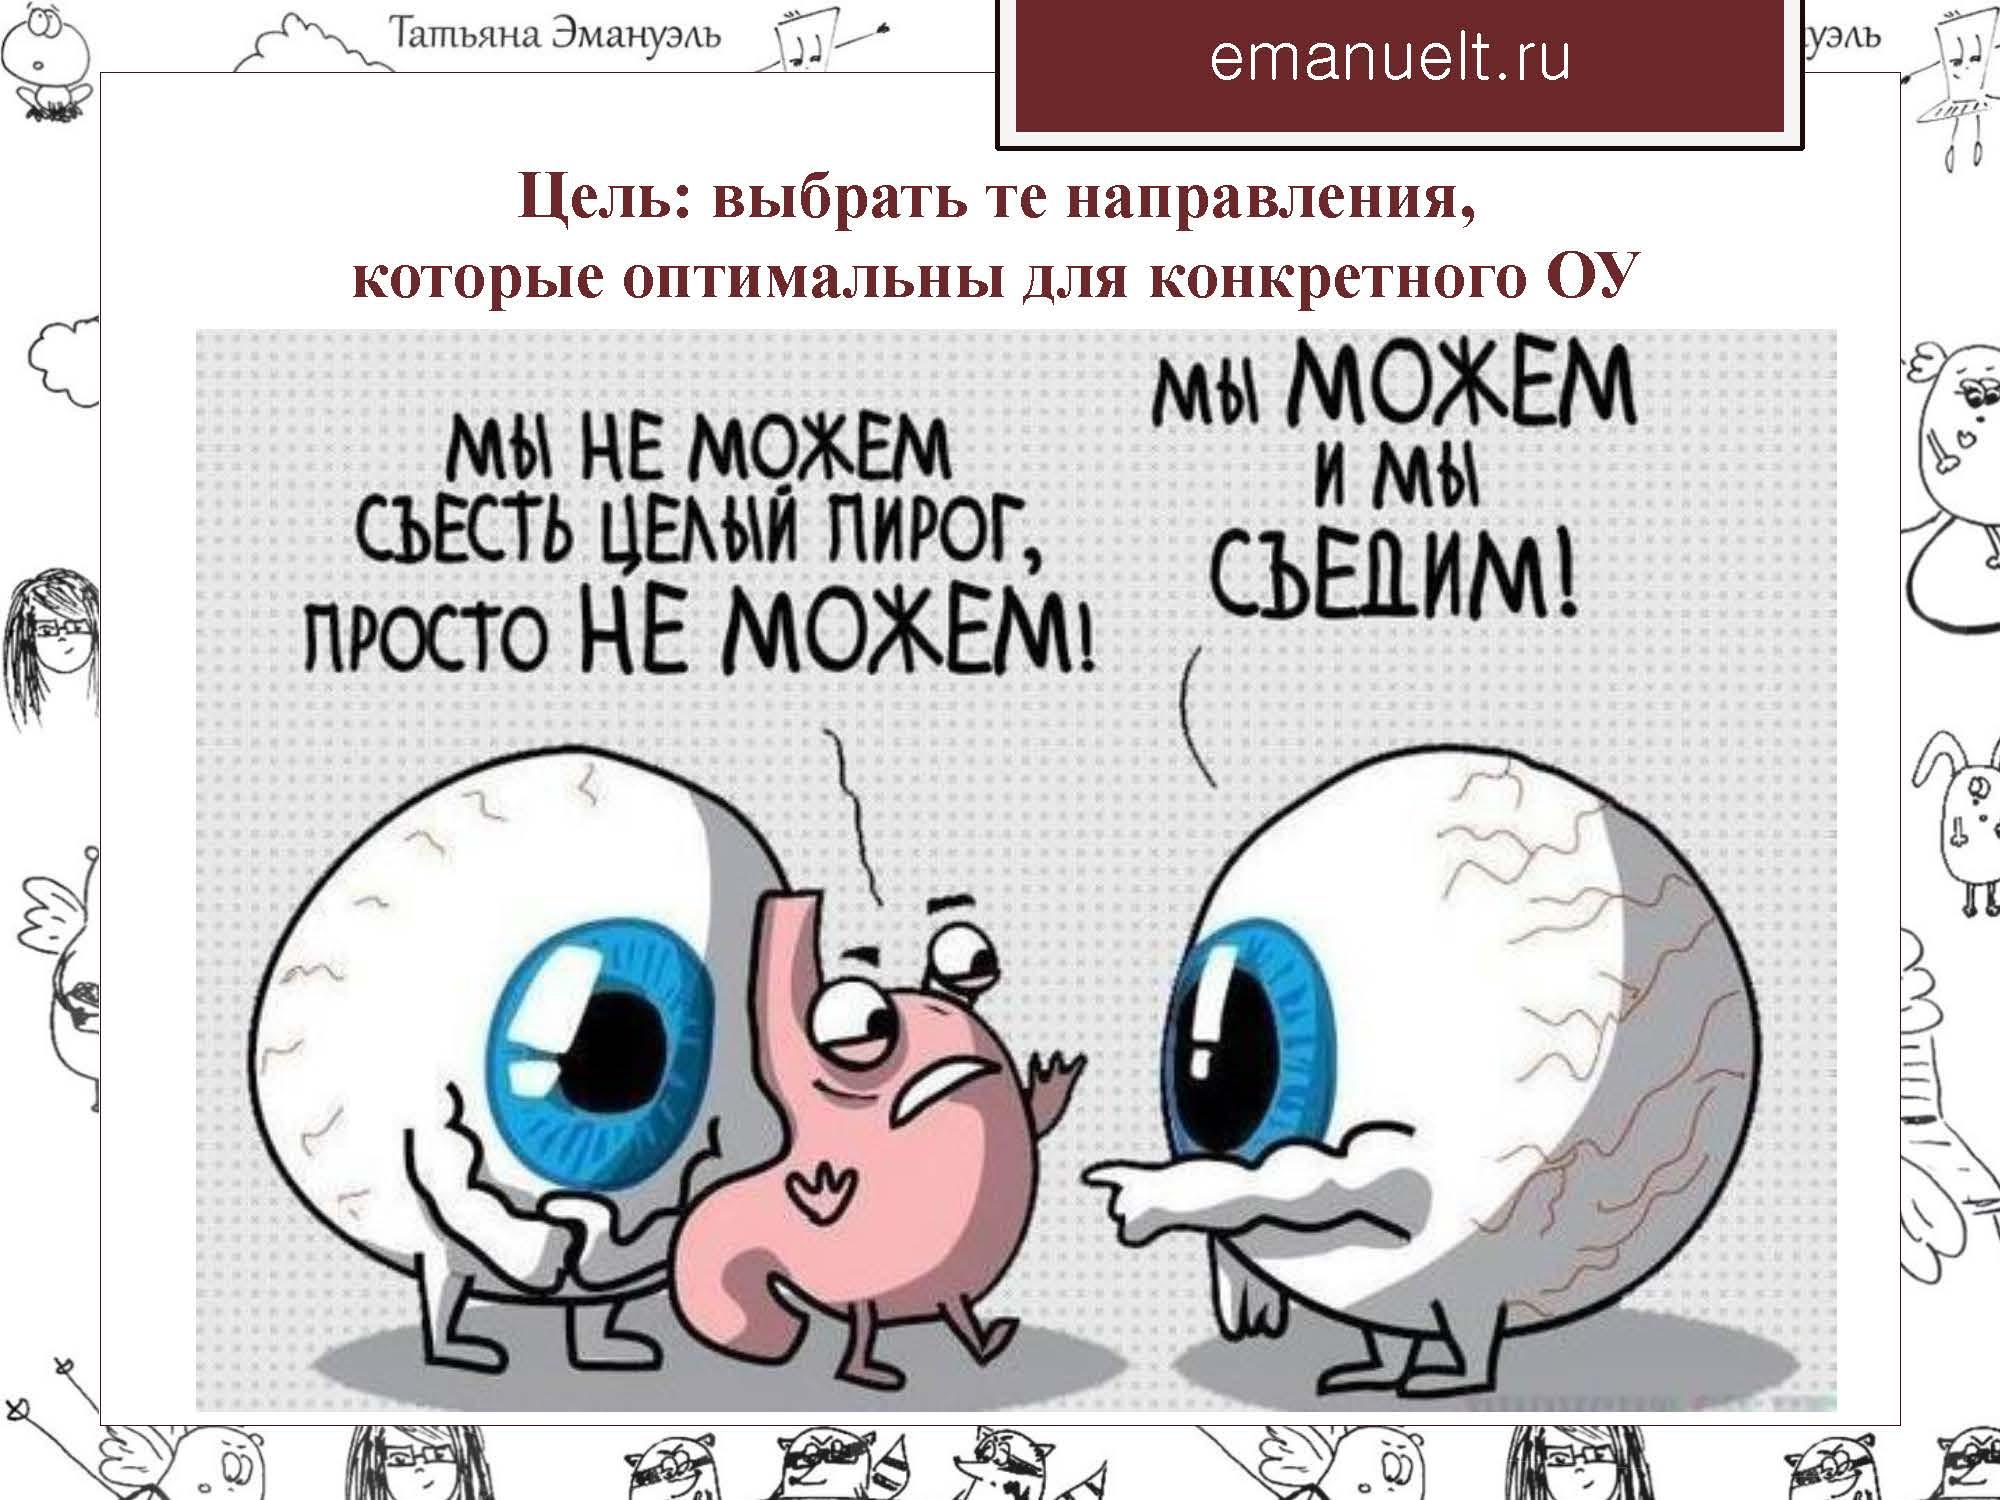 06 февраля эмануэль_Страница_027